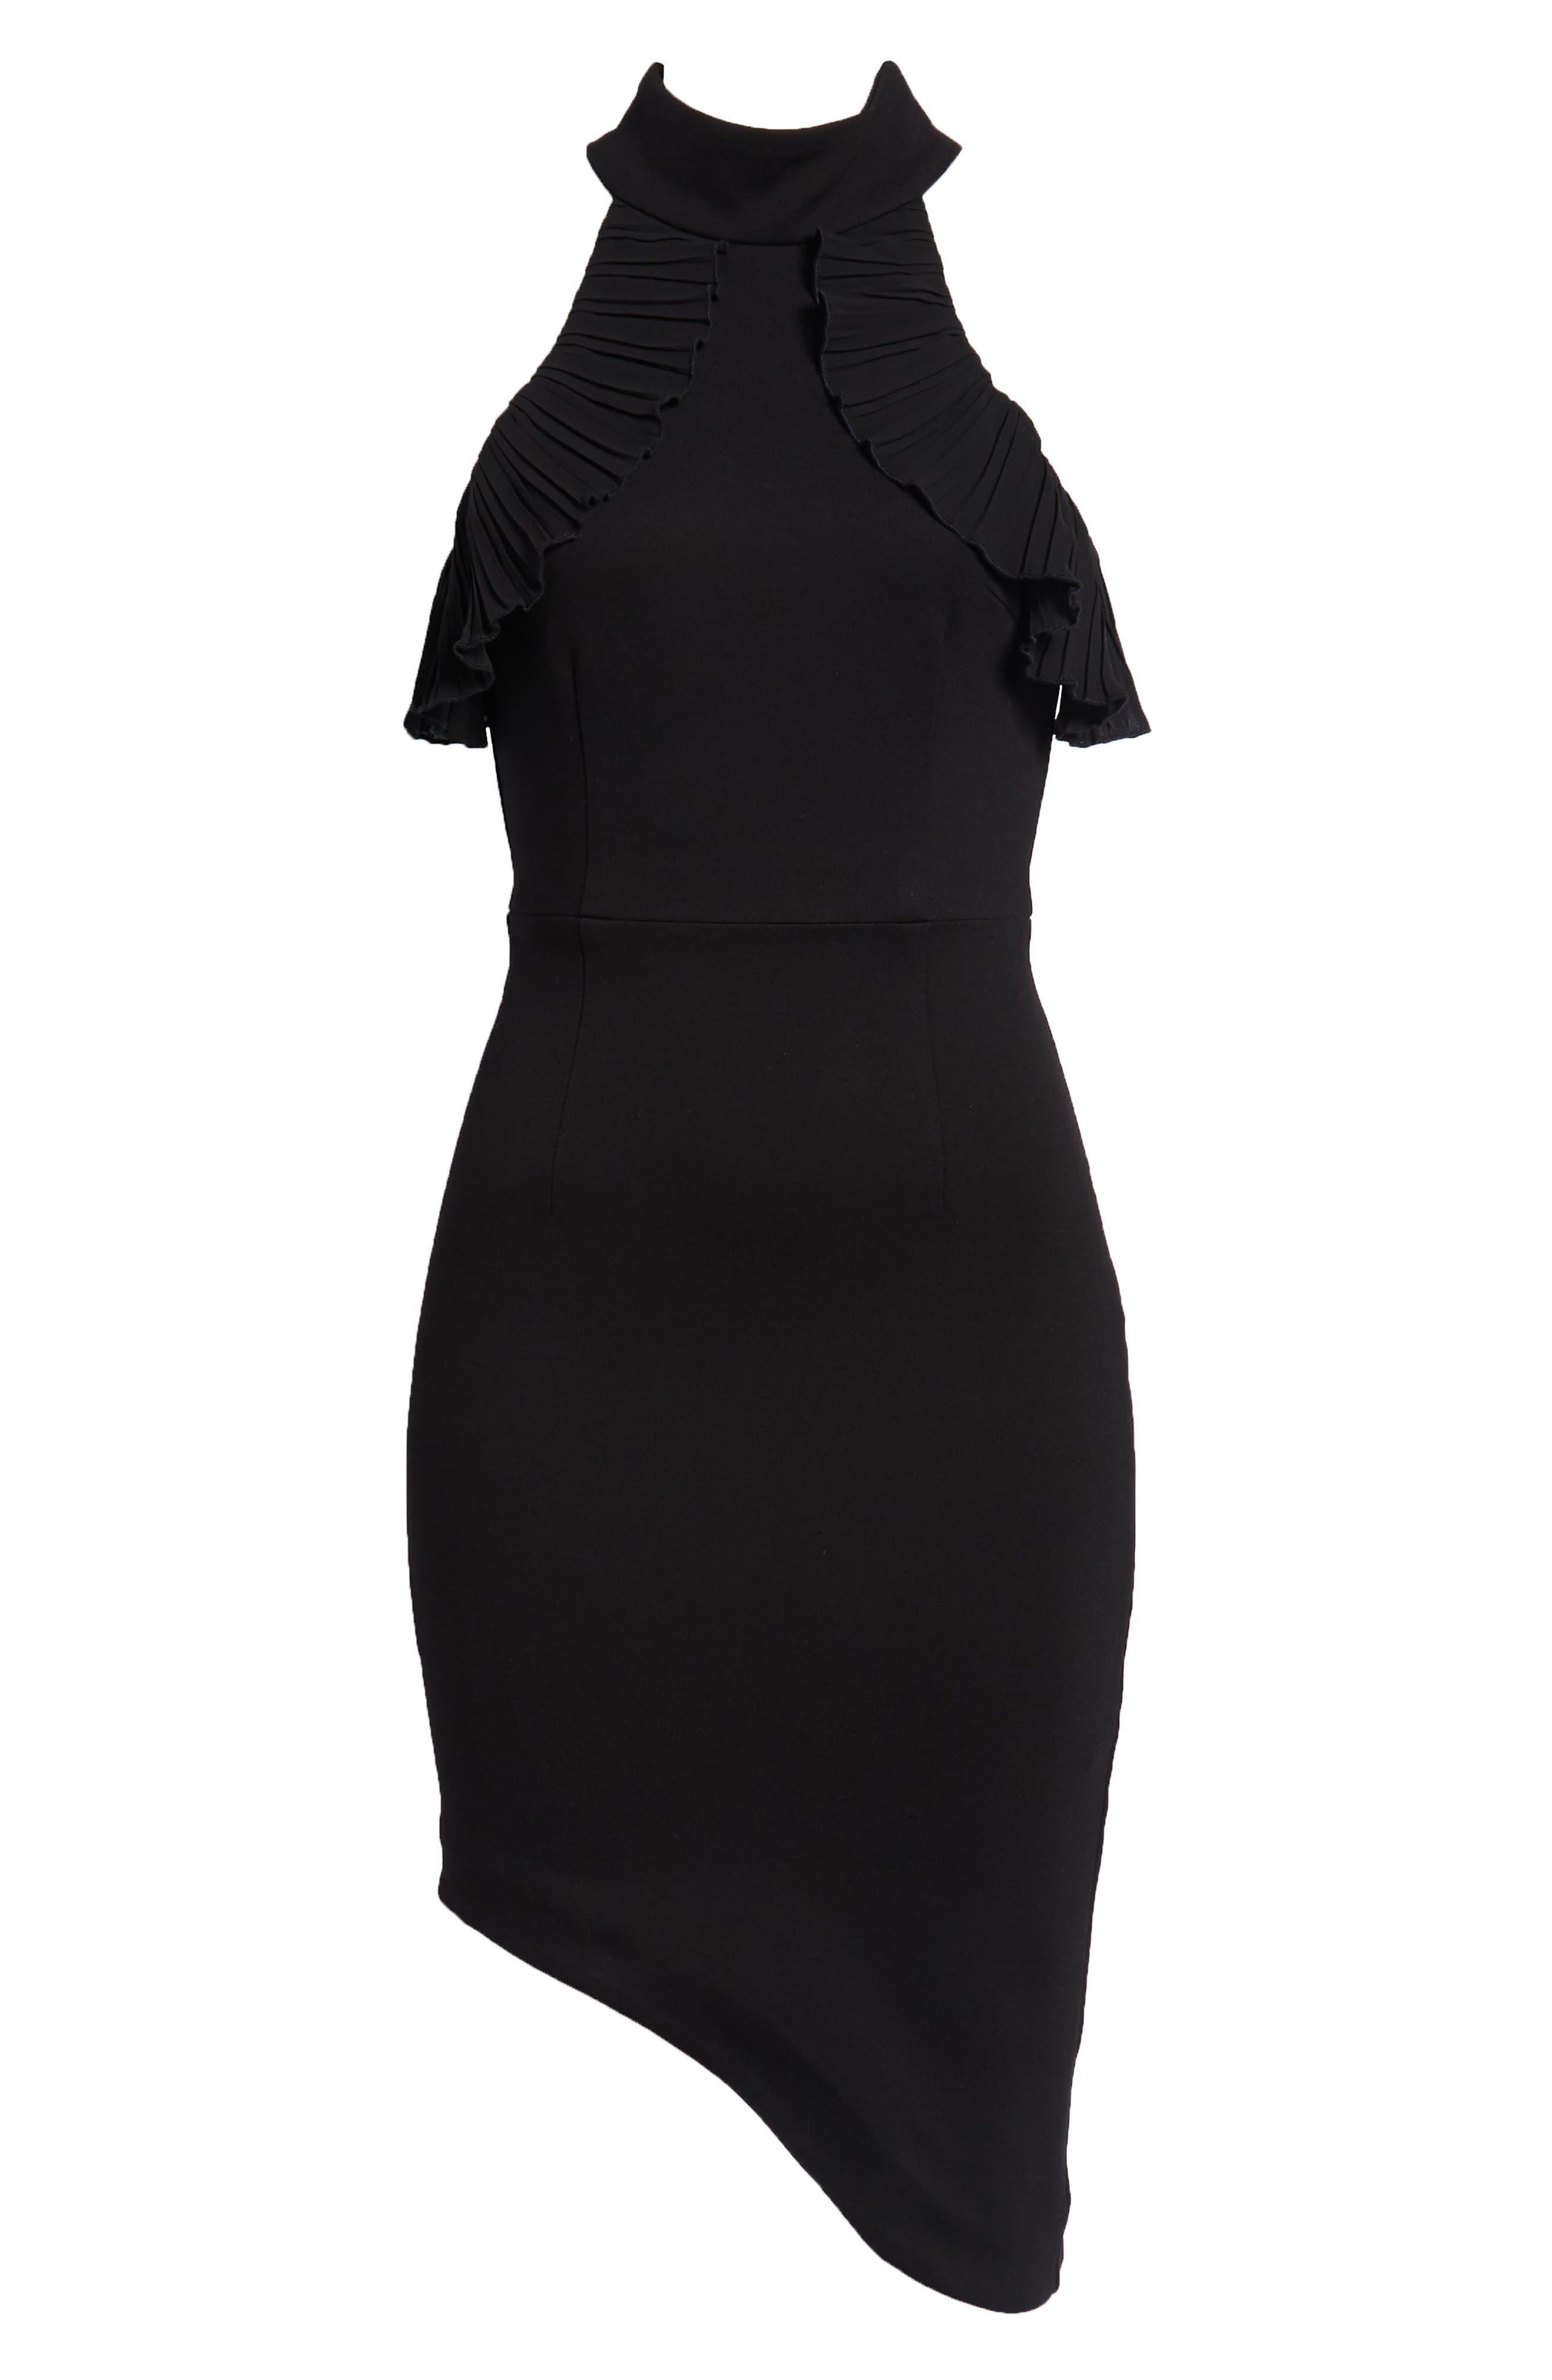 Exposition Dress,                             Alternate thumbnail 8, color,                             Black